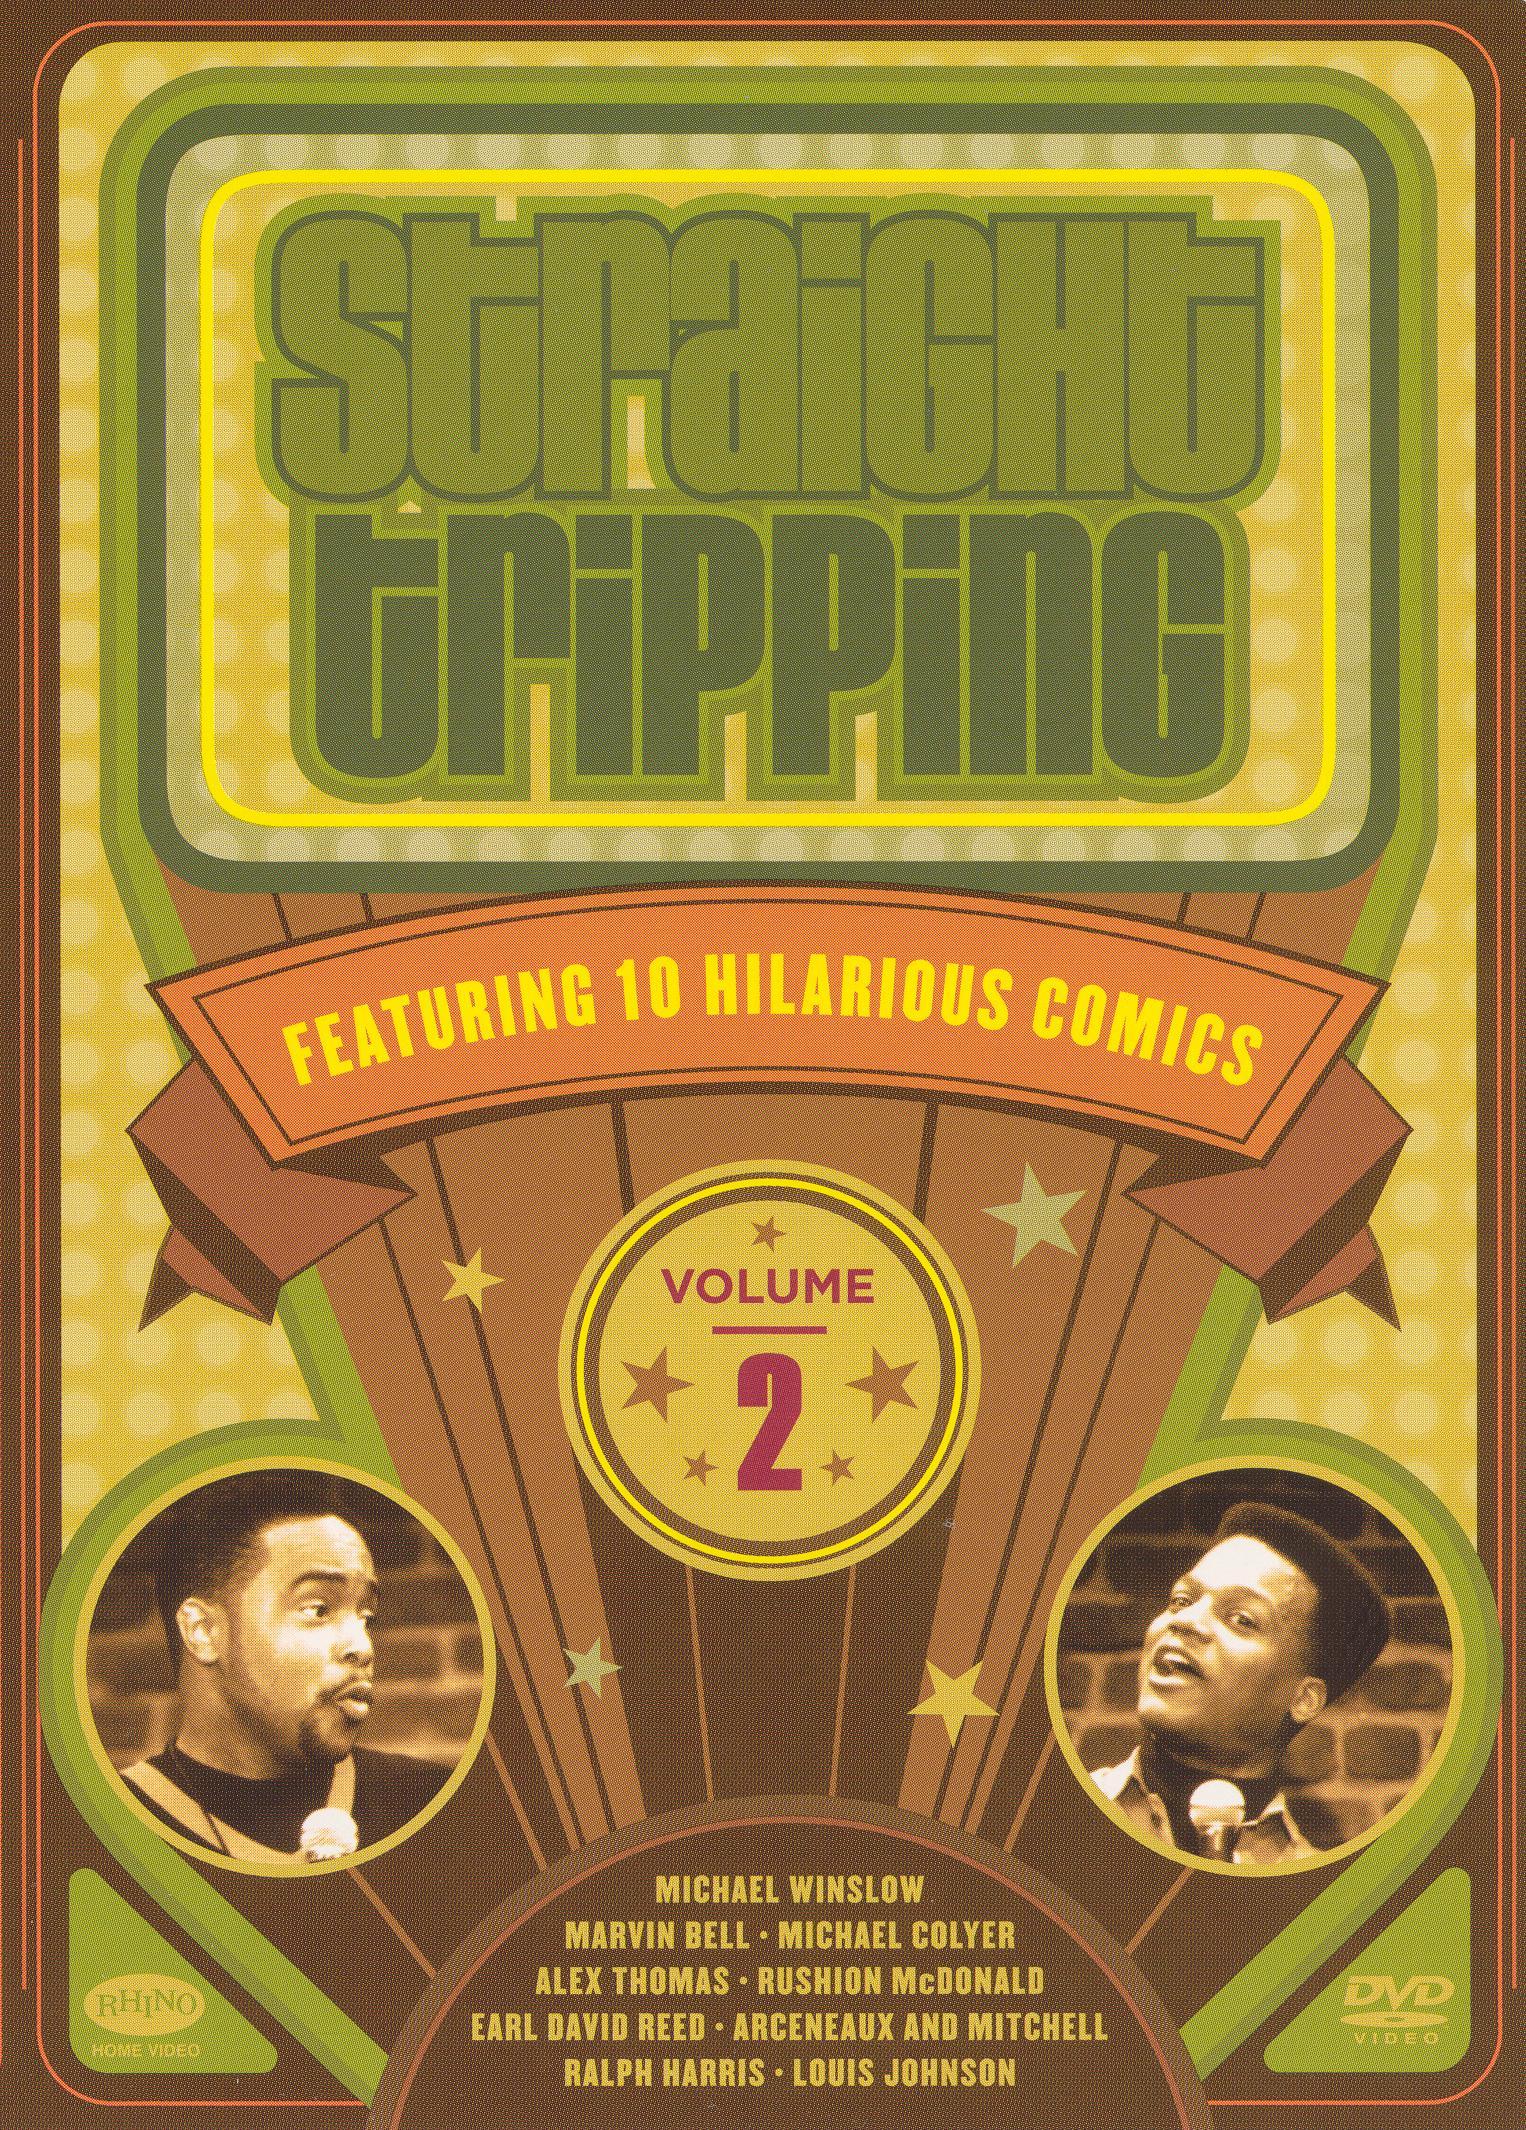 Straight Tripping, Vol. 2